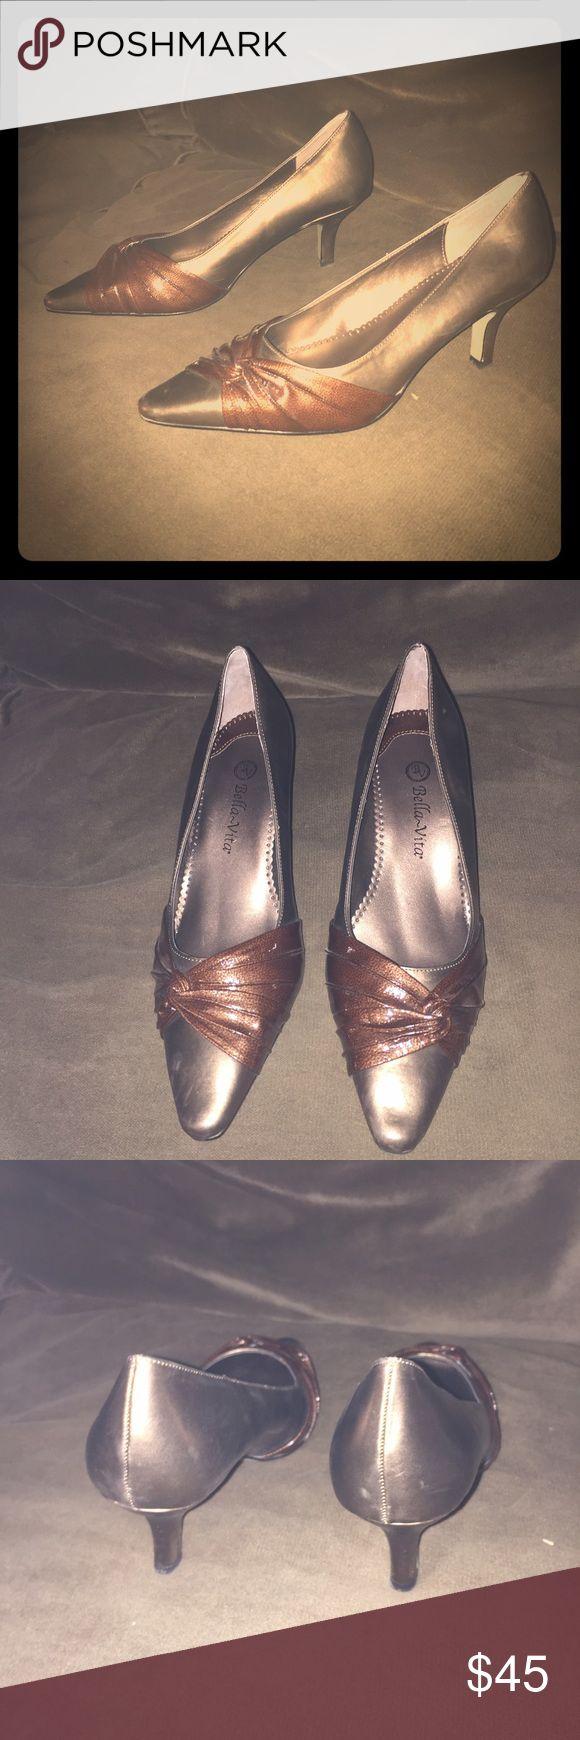 BRAND NEW BELLA VITA HEELS . Gorgeous! NWOT NEVER WORN. Wide. Bella Vita Shoes Heels